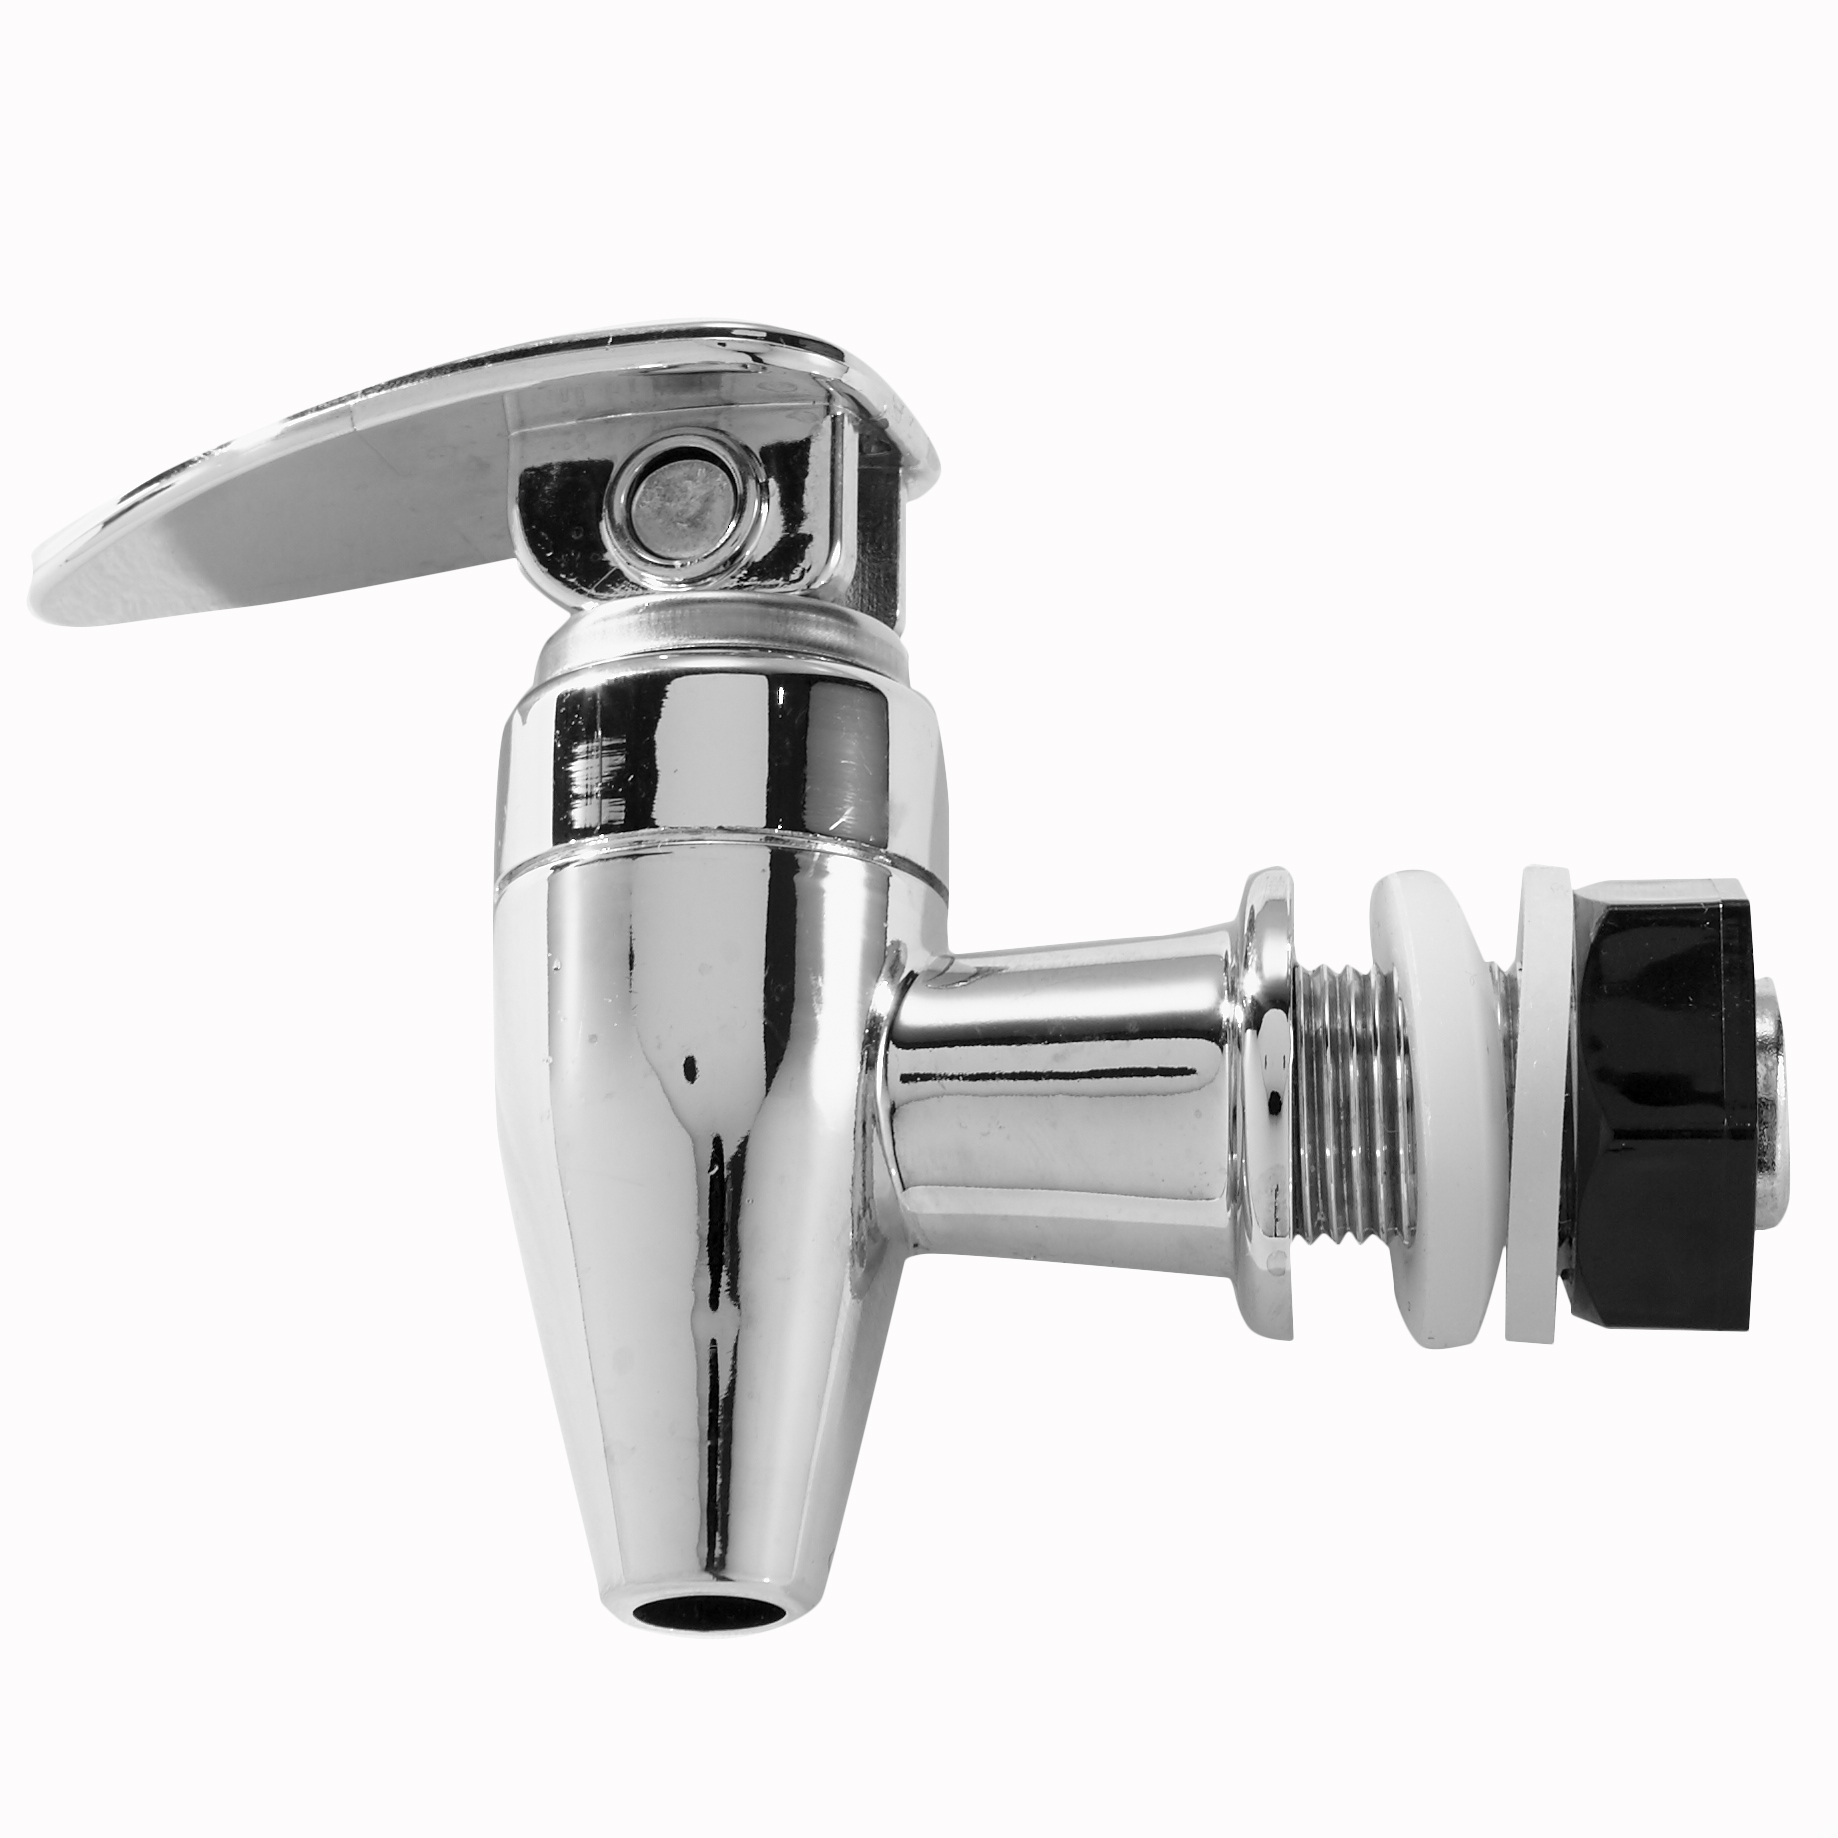 American Metalcraft JFAUC5 beverage dispenser, faucet / spigot